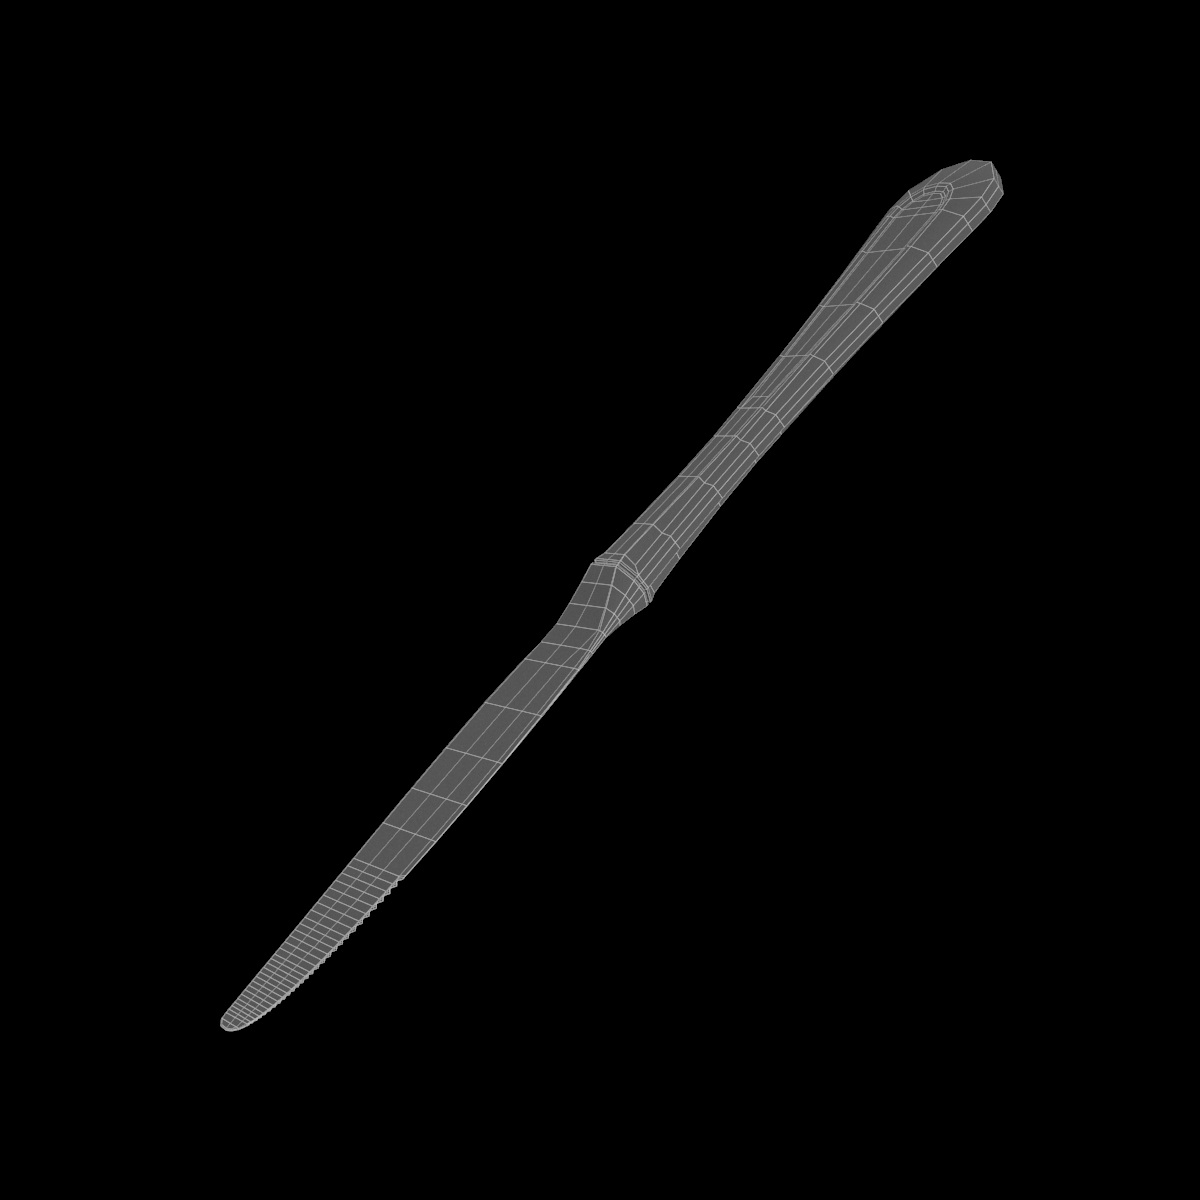 desertni nož klasični pribor 3d model 3ds c4d stl txt png fbx max max ma mb obj 285240